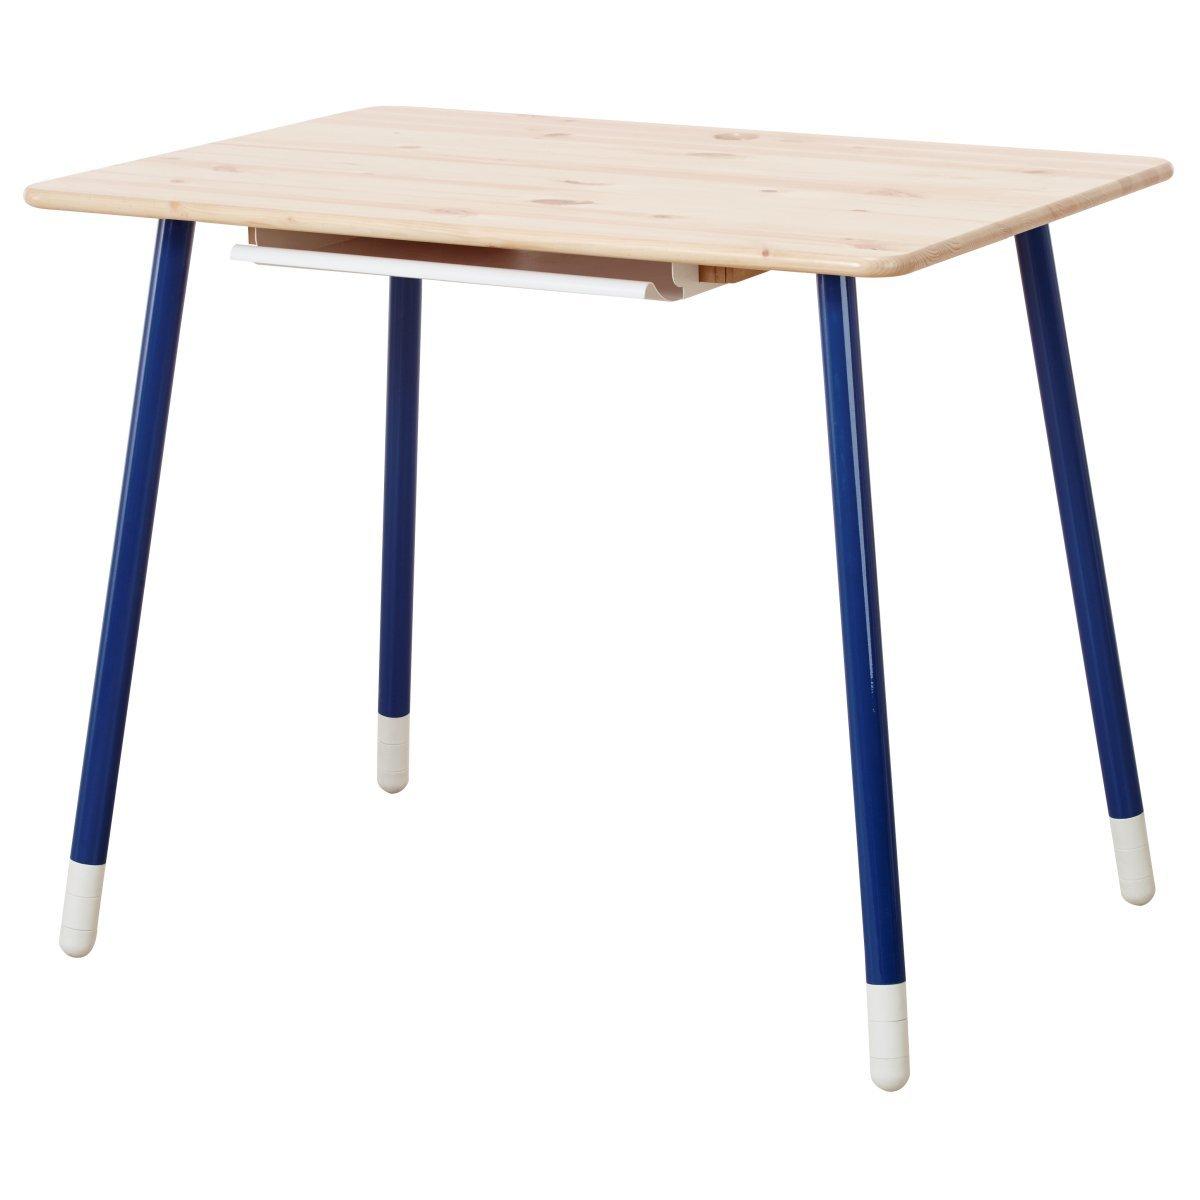 flexa classic schreibtisch in natur blau 82 50089 1 210. Black Bedroom Furniture Sets. Home Design Ideas